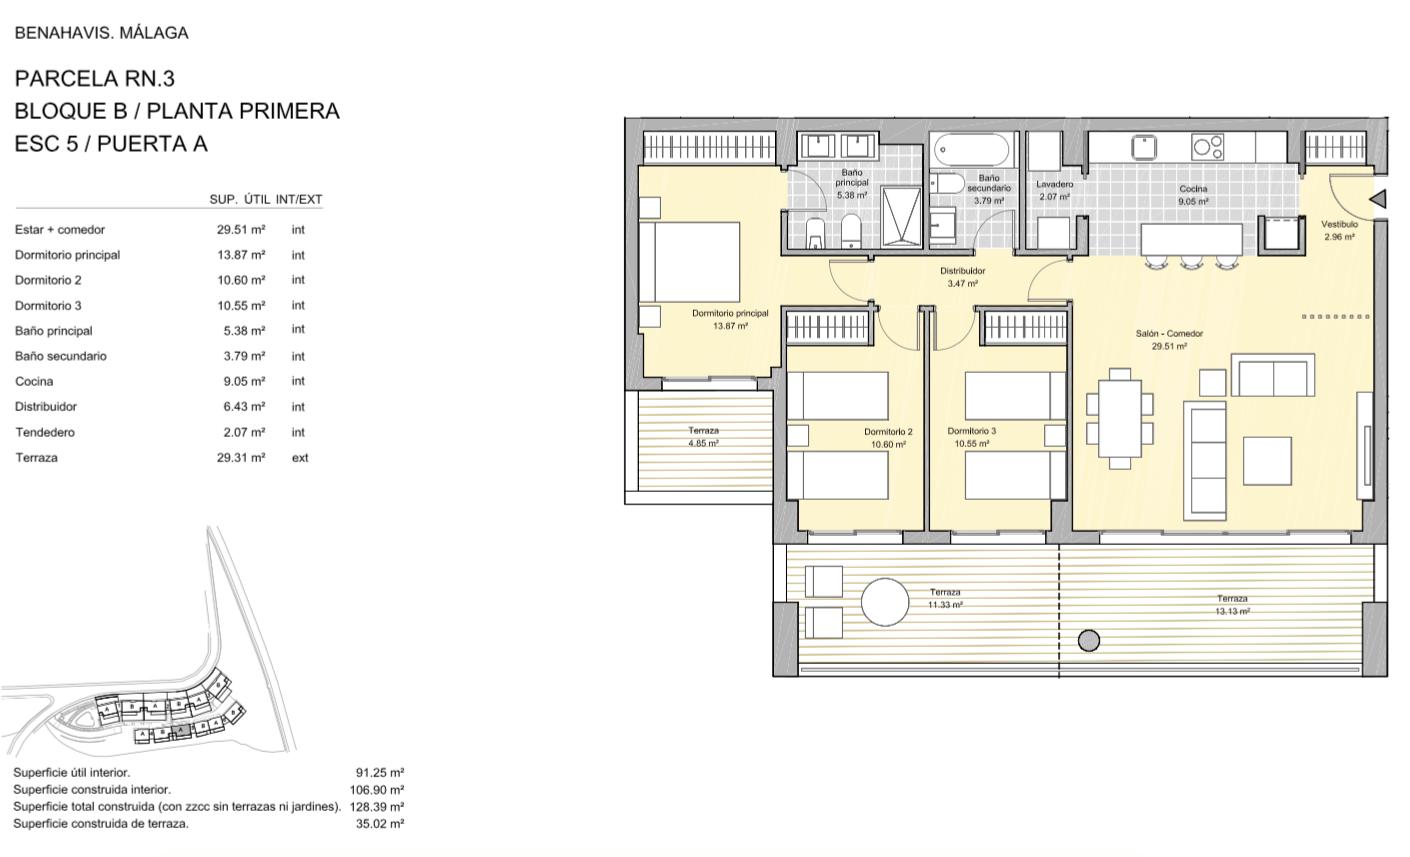 alborada homes benahavis golf la quinta moderne appartementen penthouses te koop grondplan RN3 51A verdieping 3bed